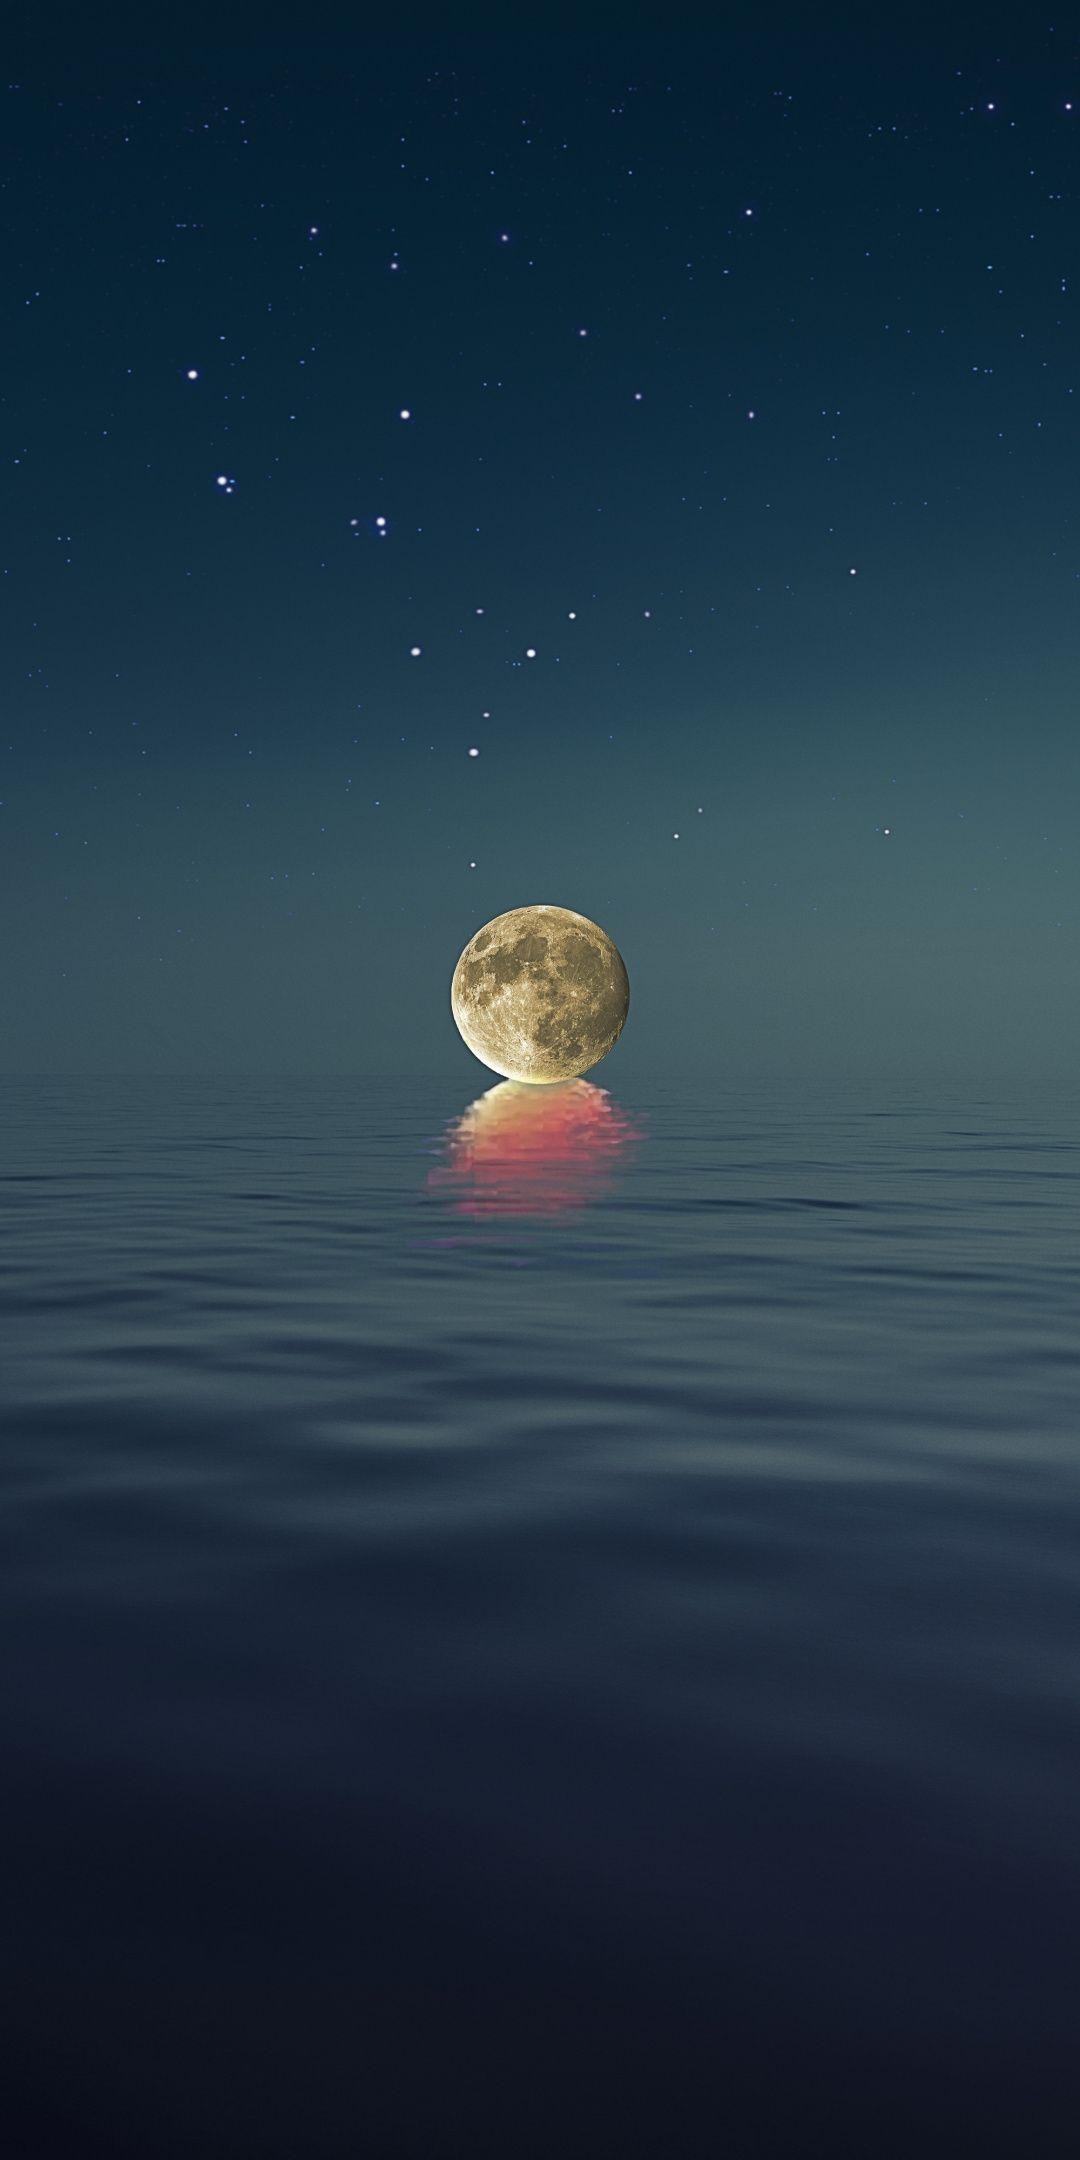 Sea Full Moon Photoshop 1080x2160 Wallpaper Full Hd Wallpaper Android Full Moon Photography Moon Sea